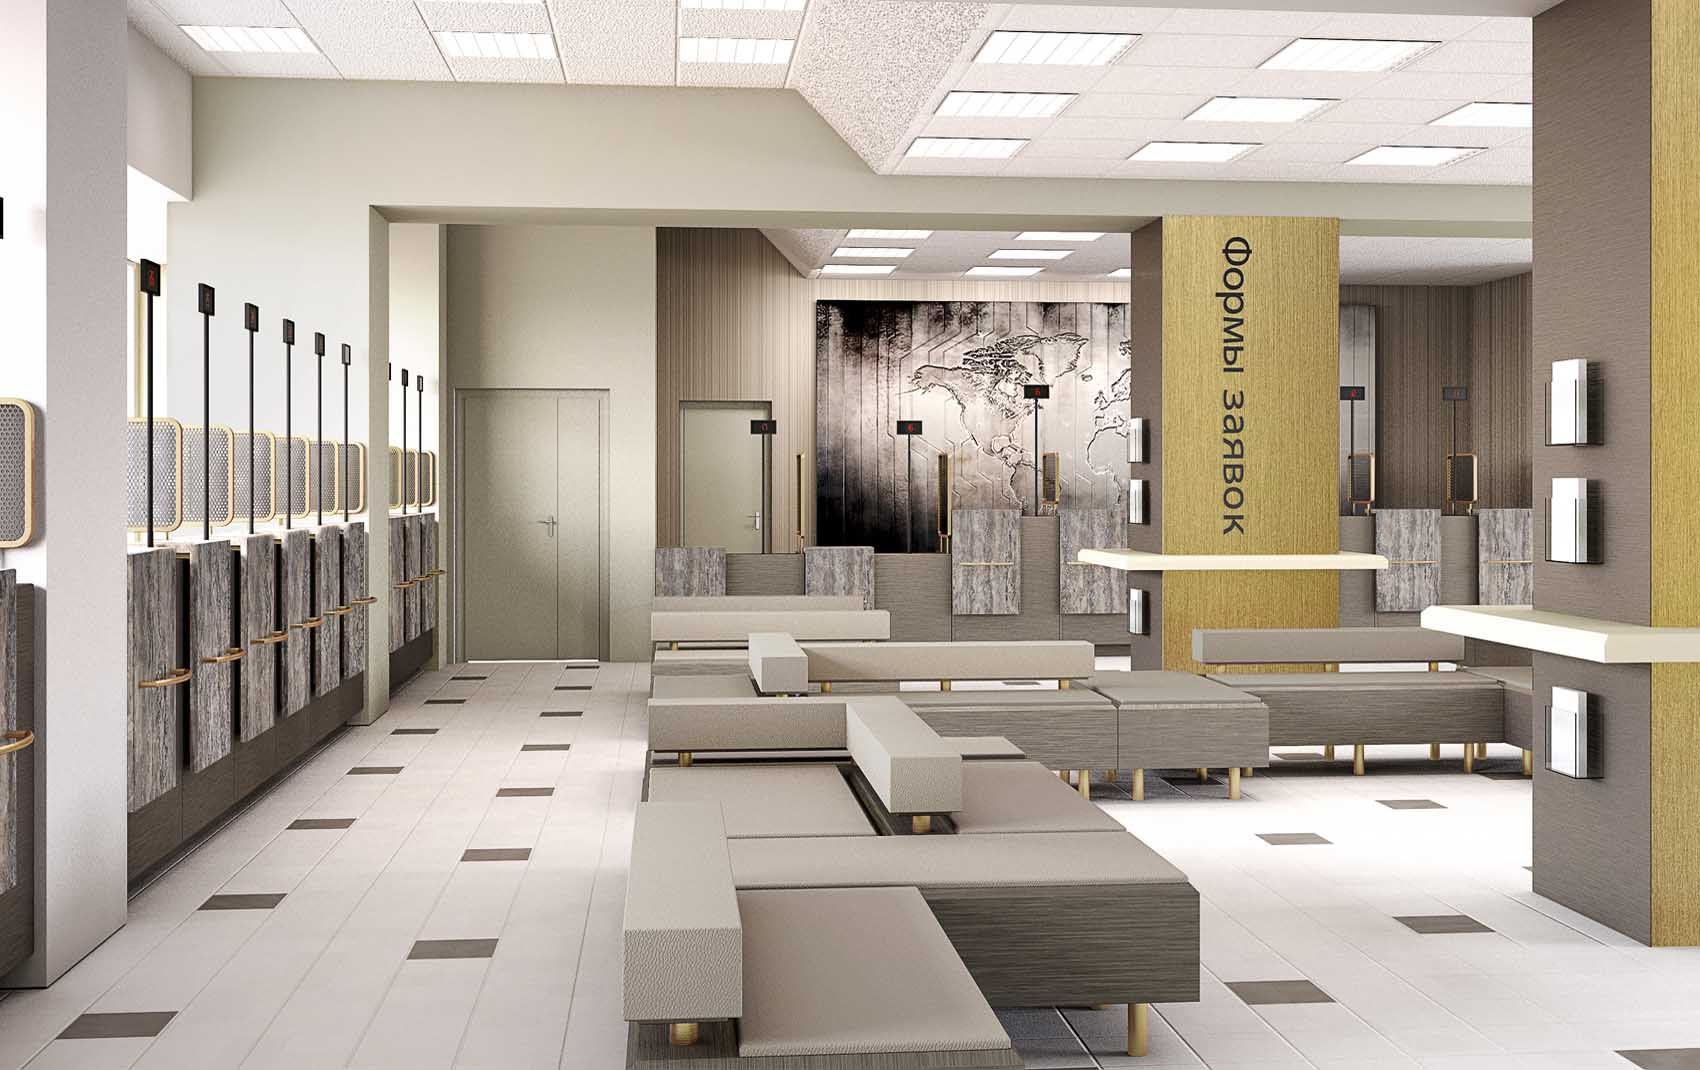 international visa centres - Commercial Interior Design